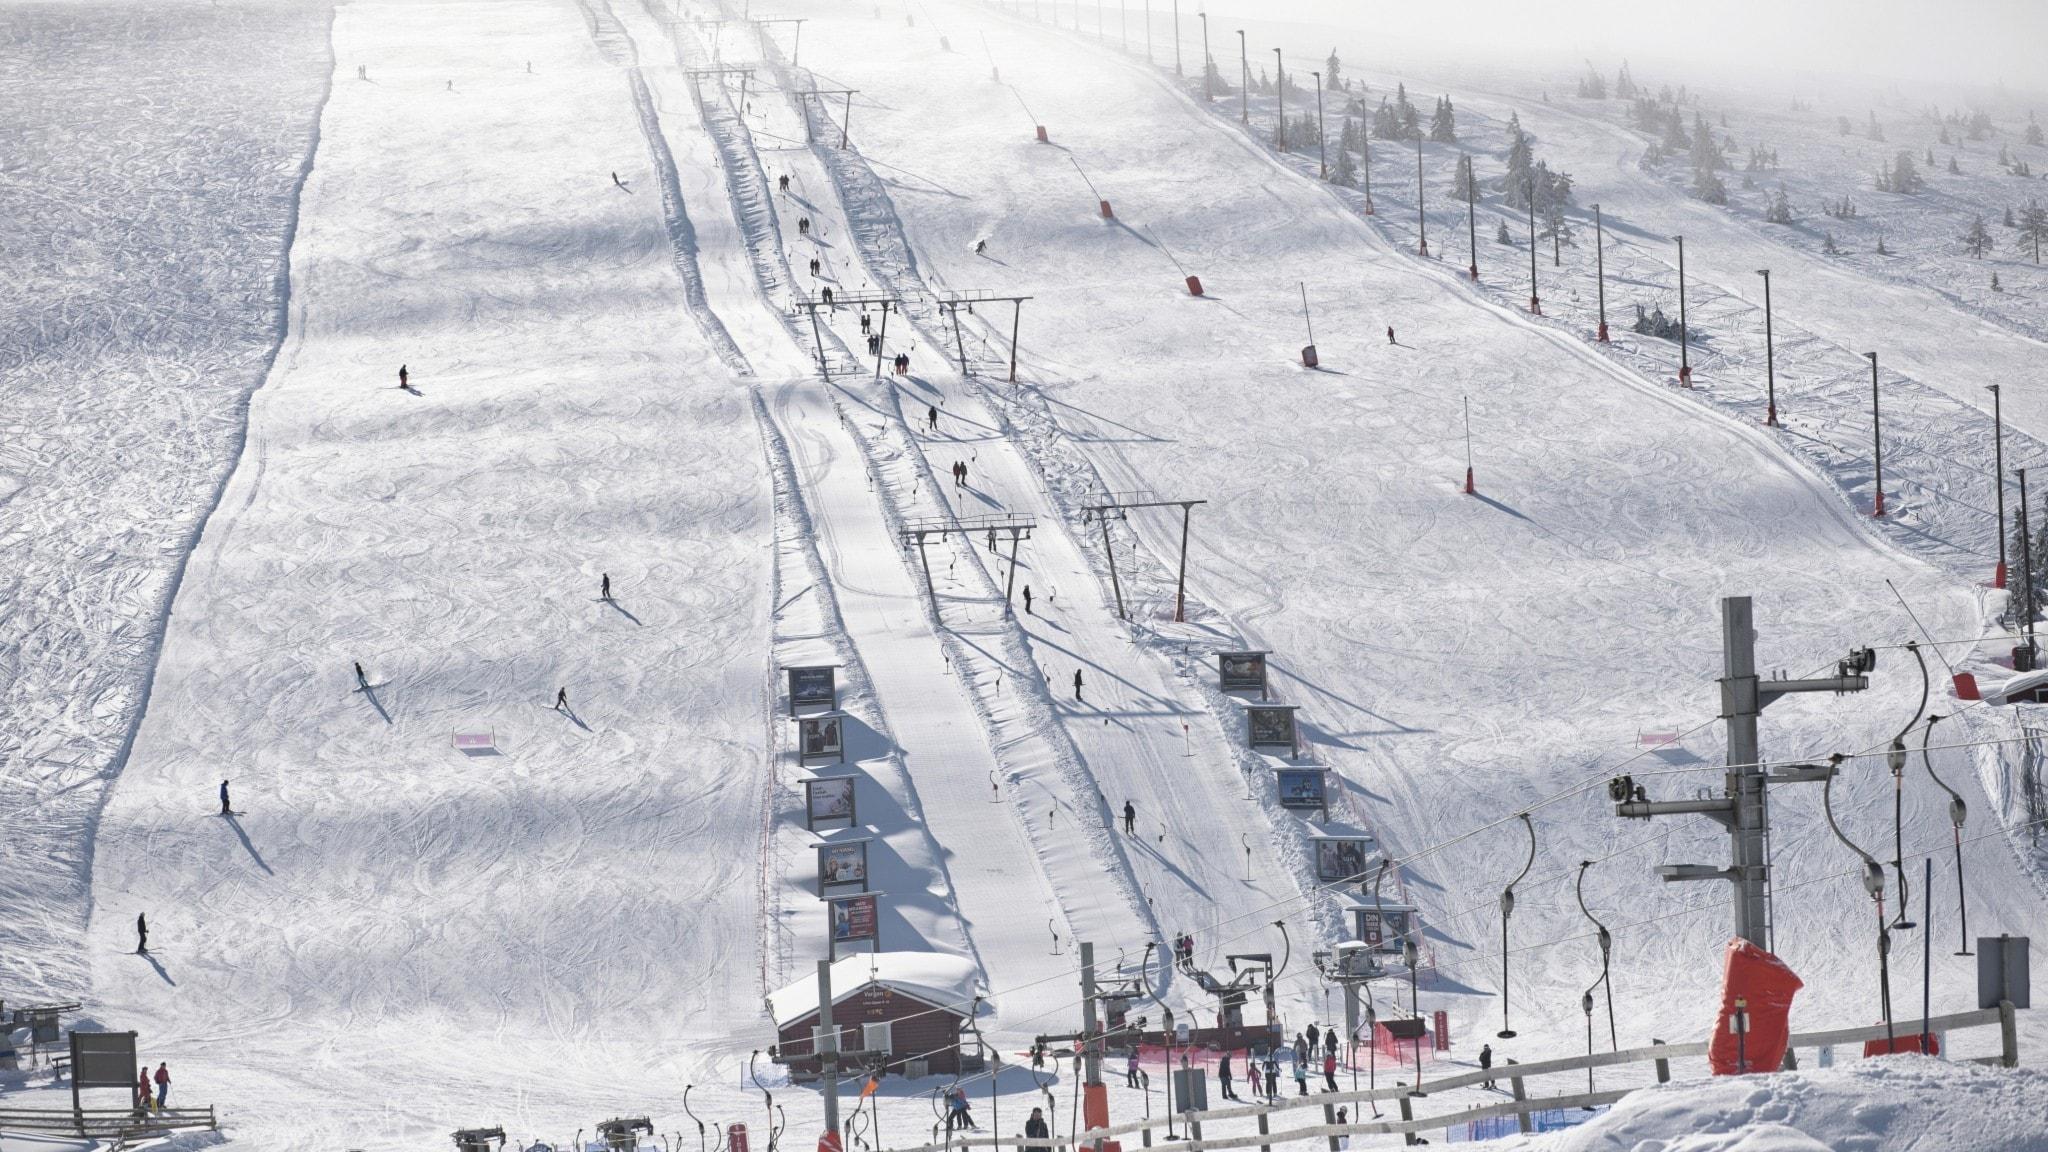 a ski slope